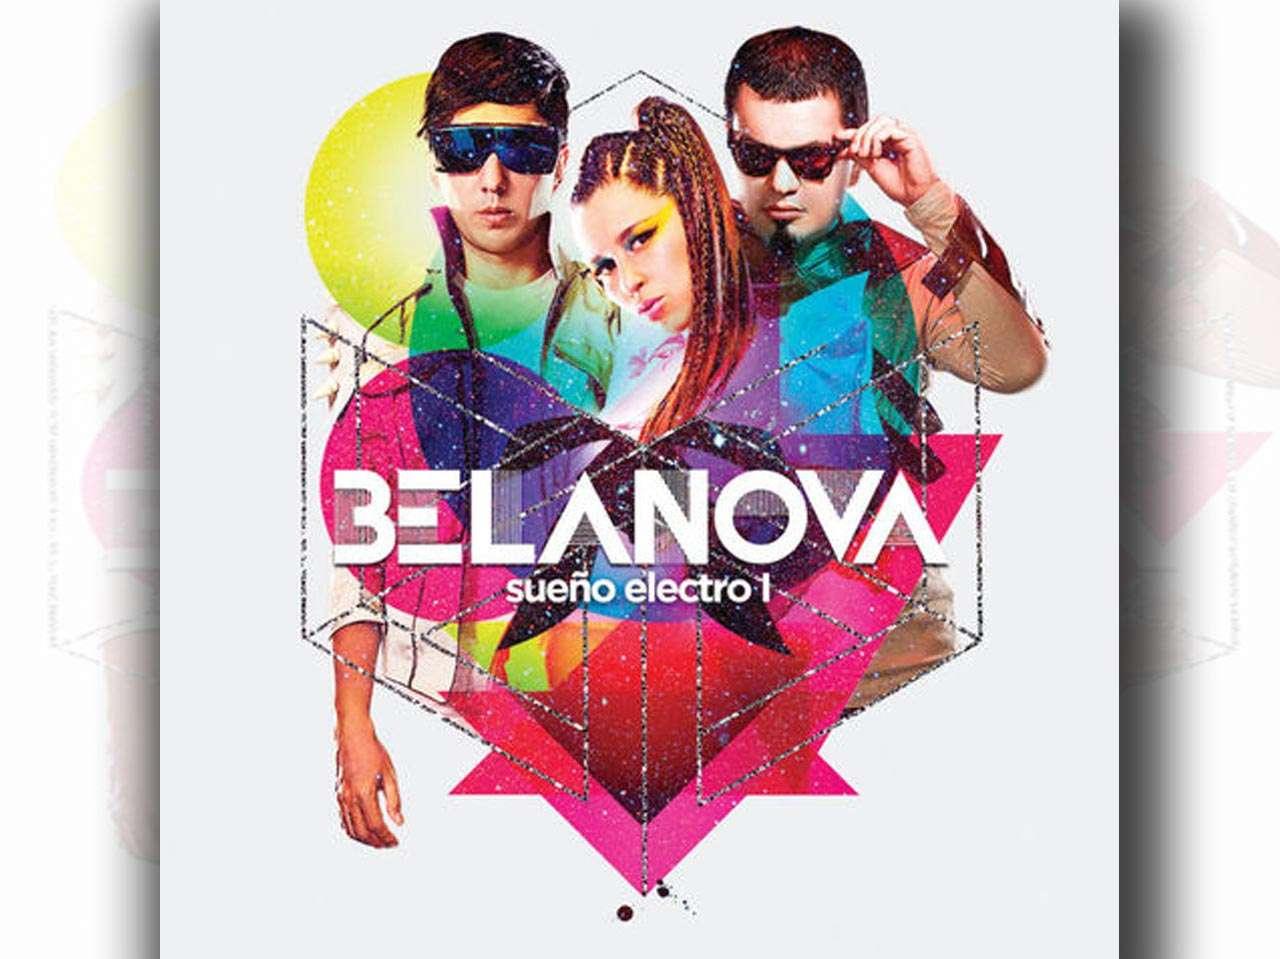 Discografía Belanova Foto: Universal Music